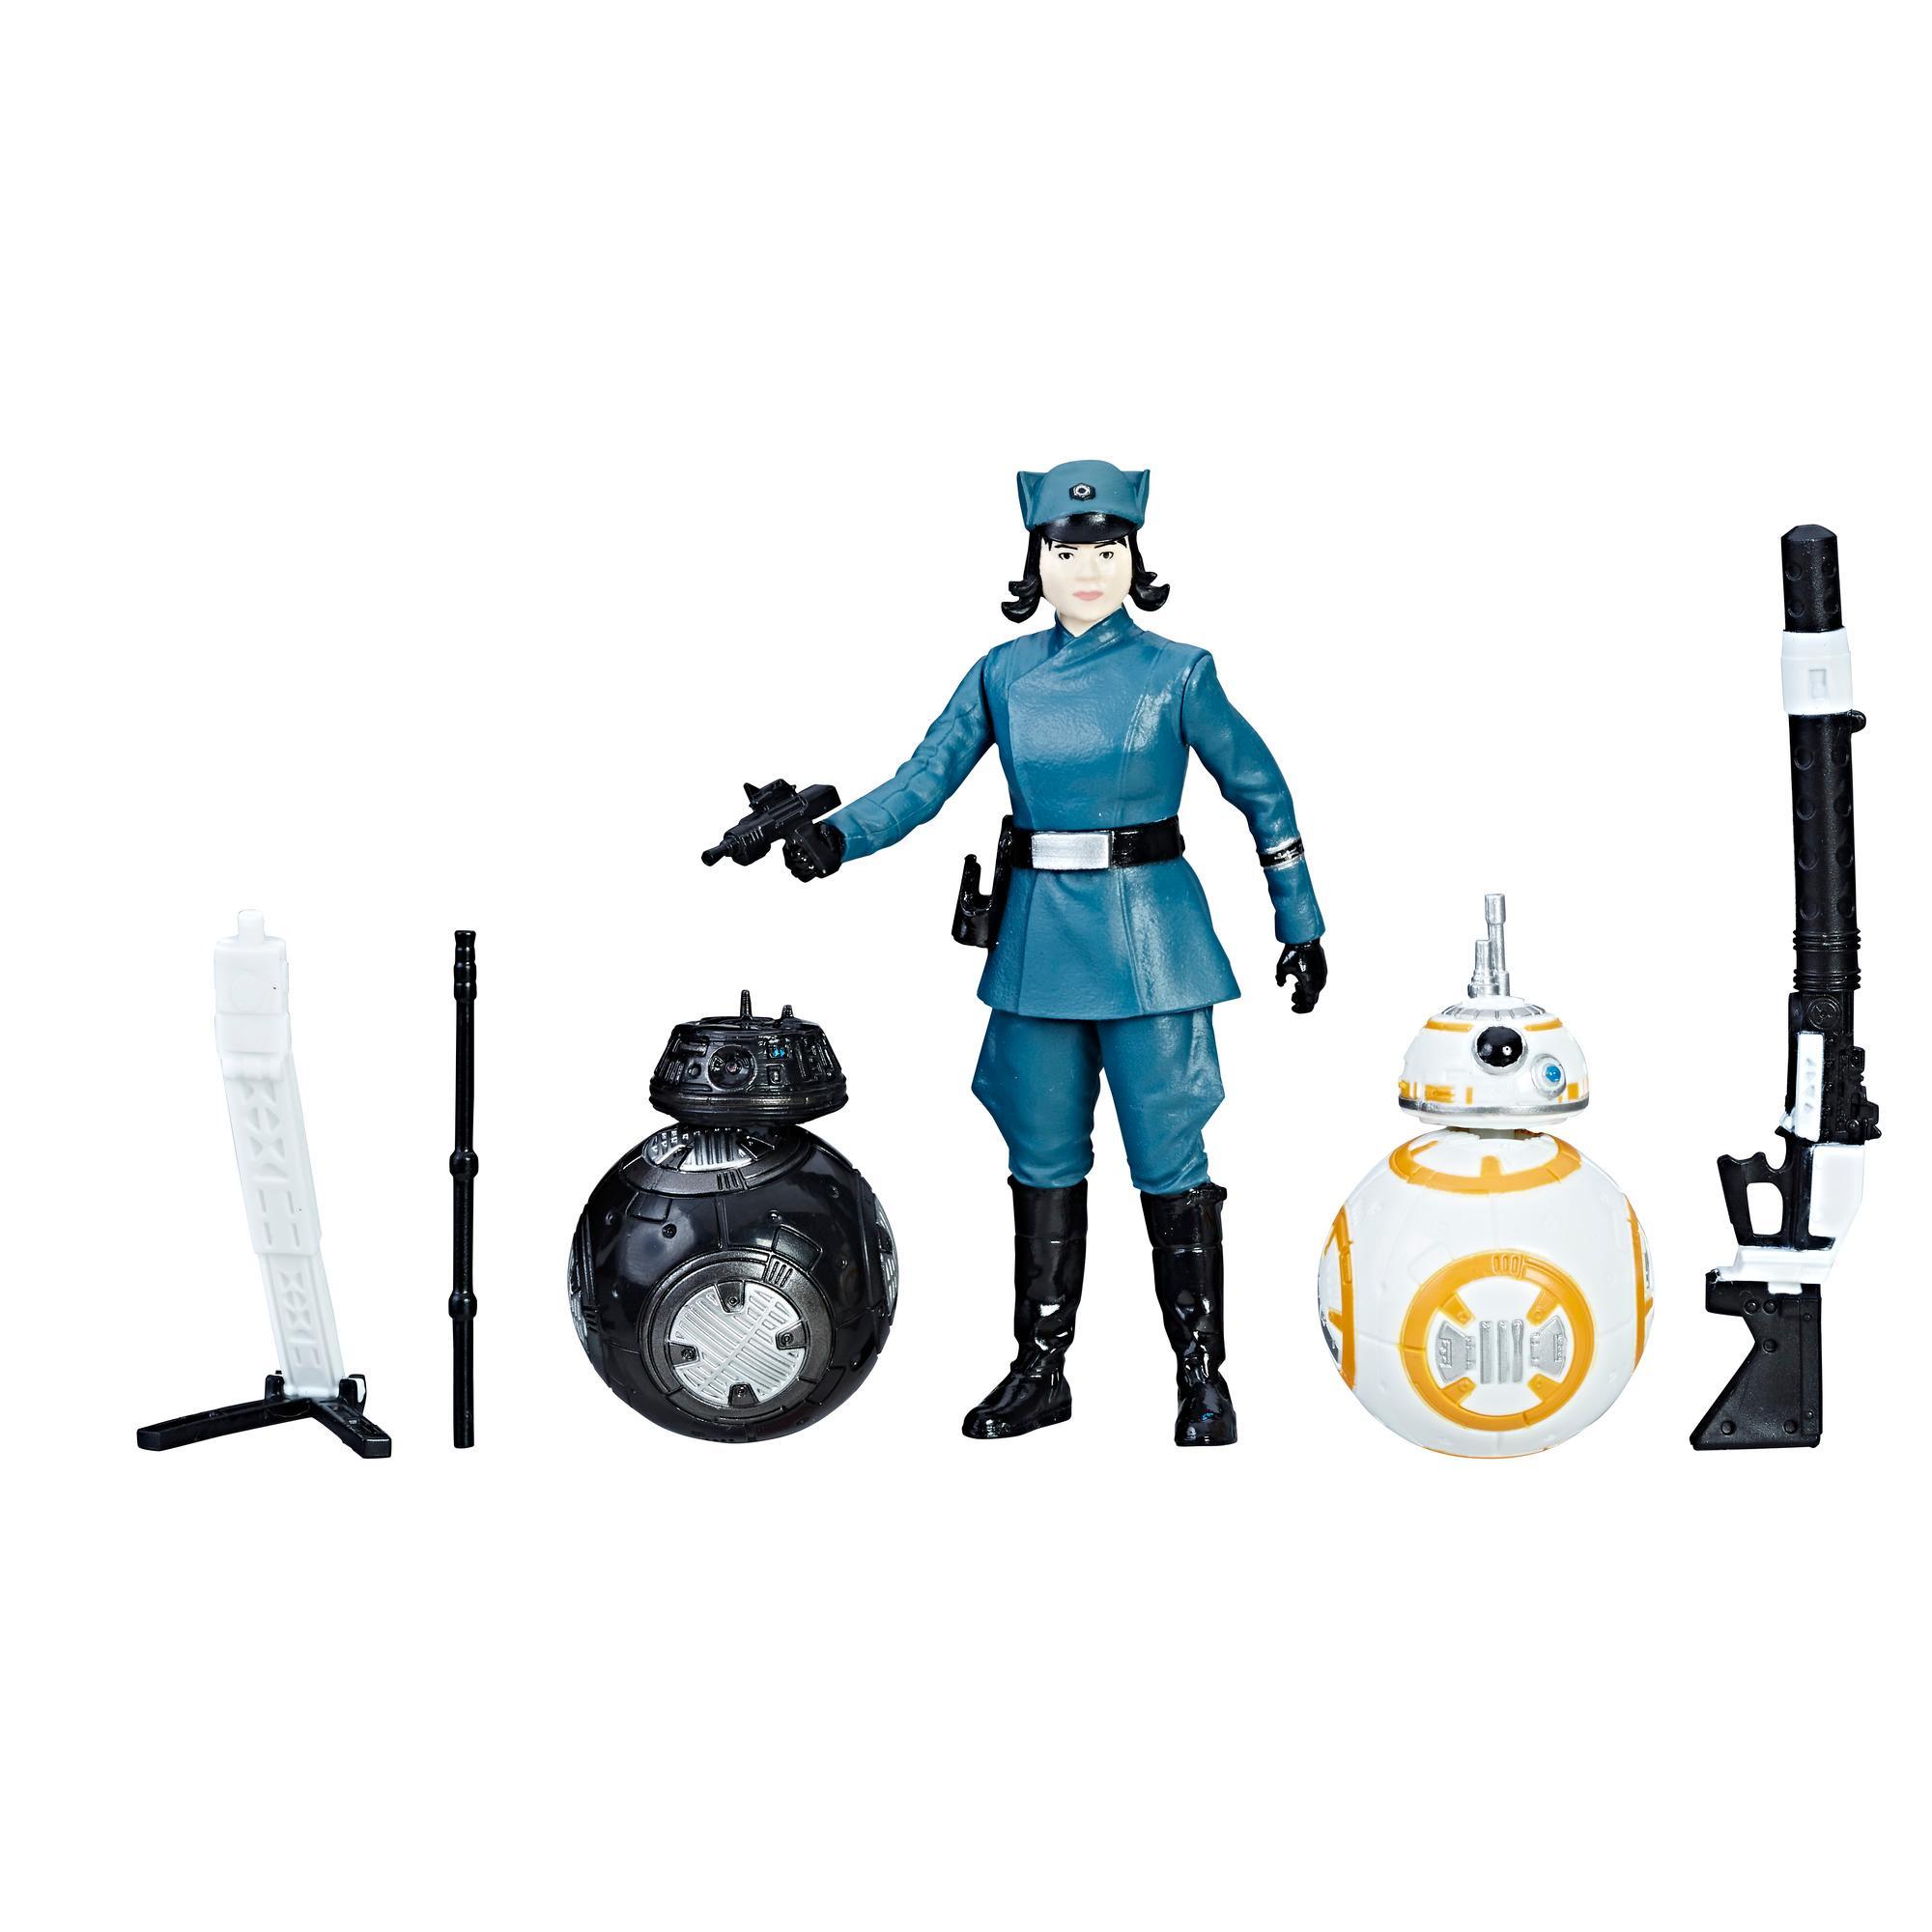 Star Wars - Ensemble Force Link Rose (En officier du Premier Ordre), BB-8, BB-9E